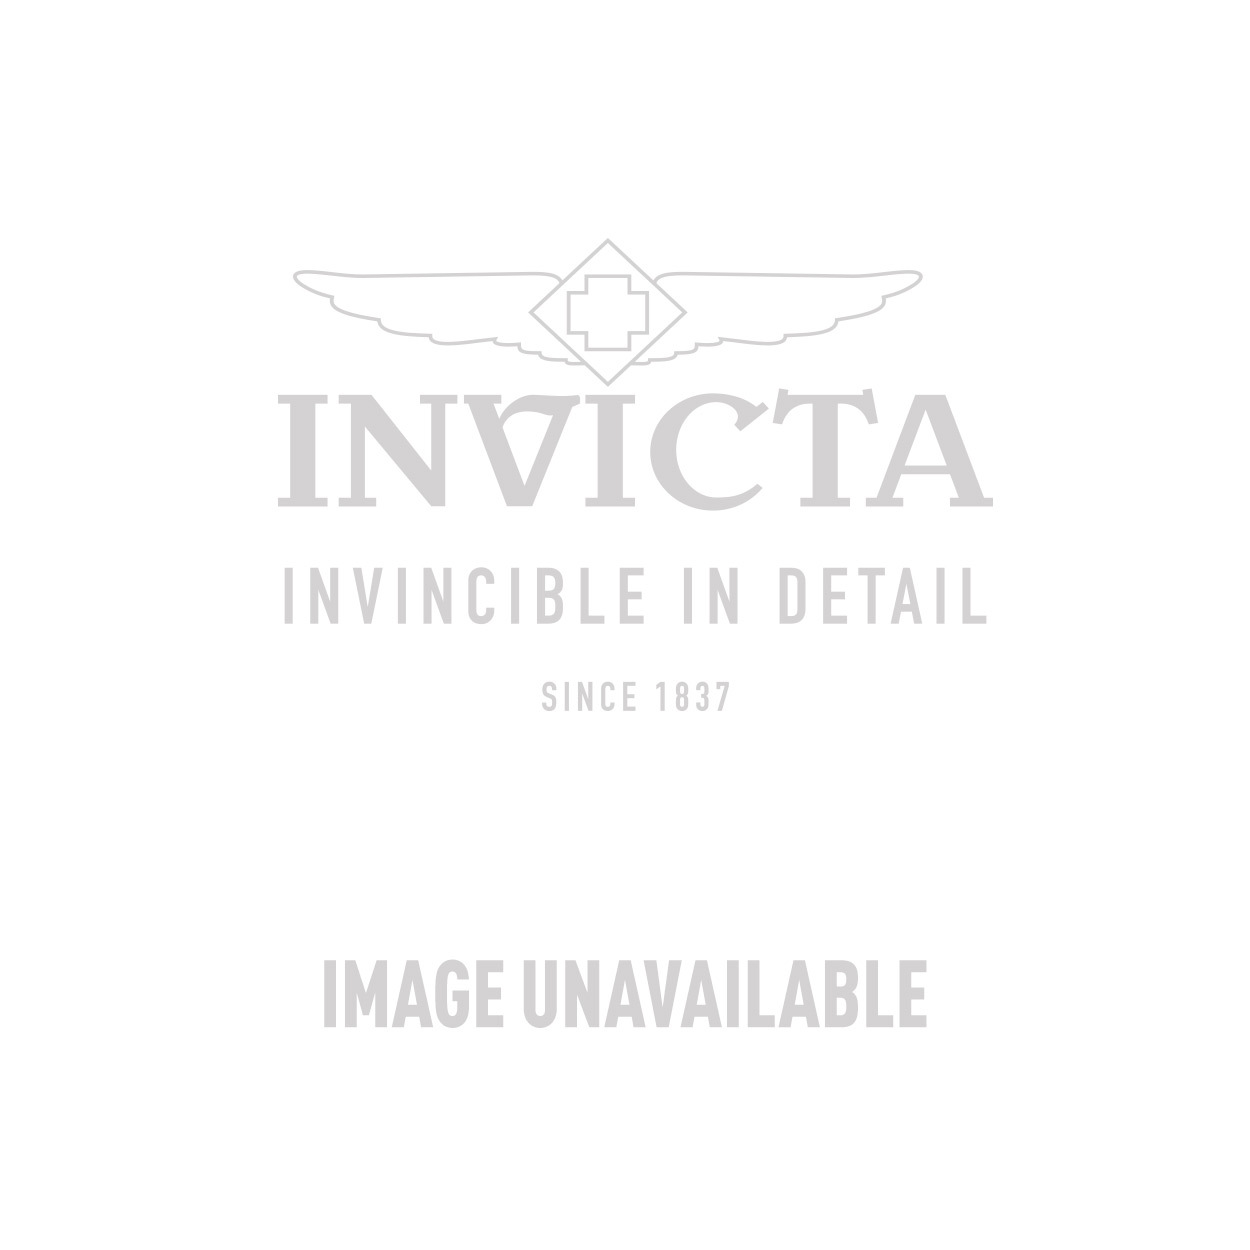 Invicta Case DC8GREY-YEL